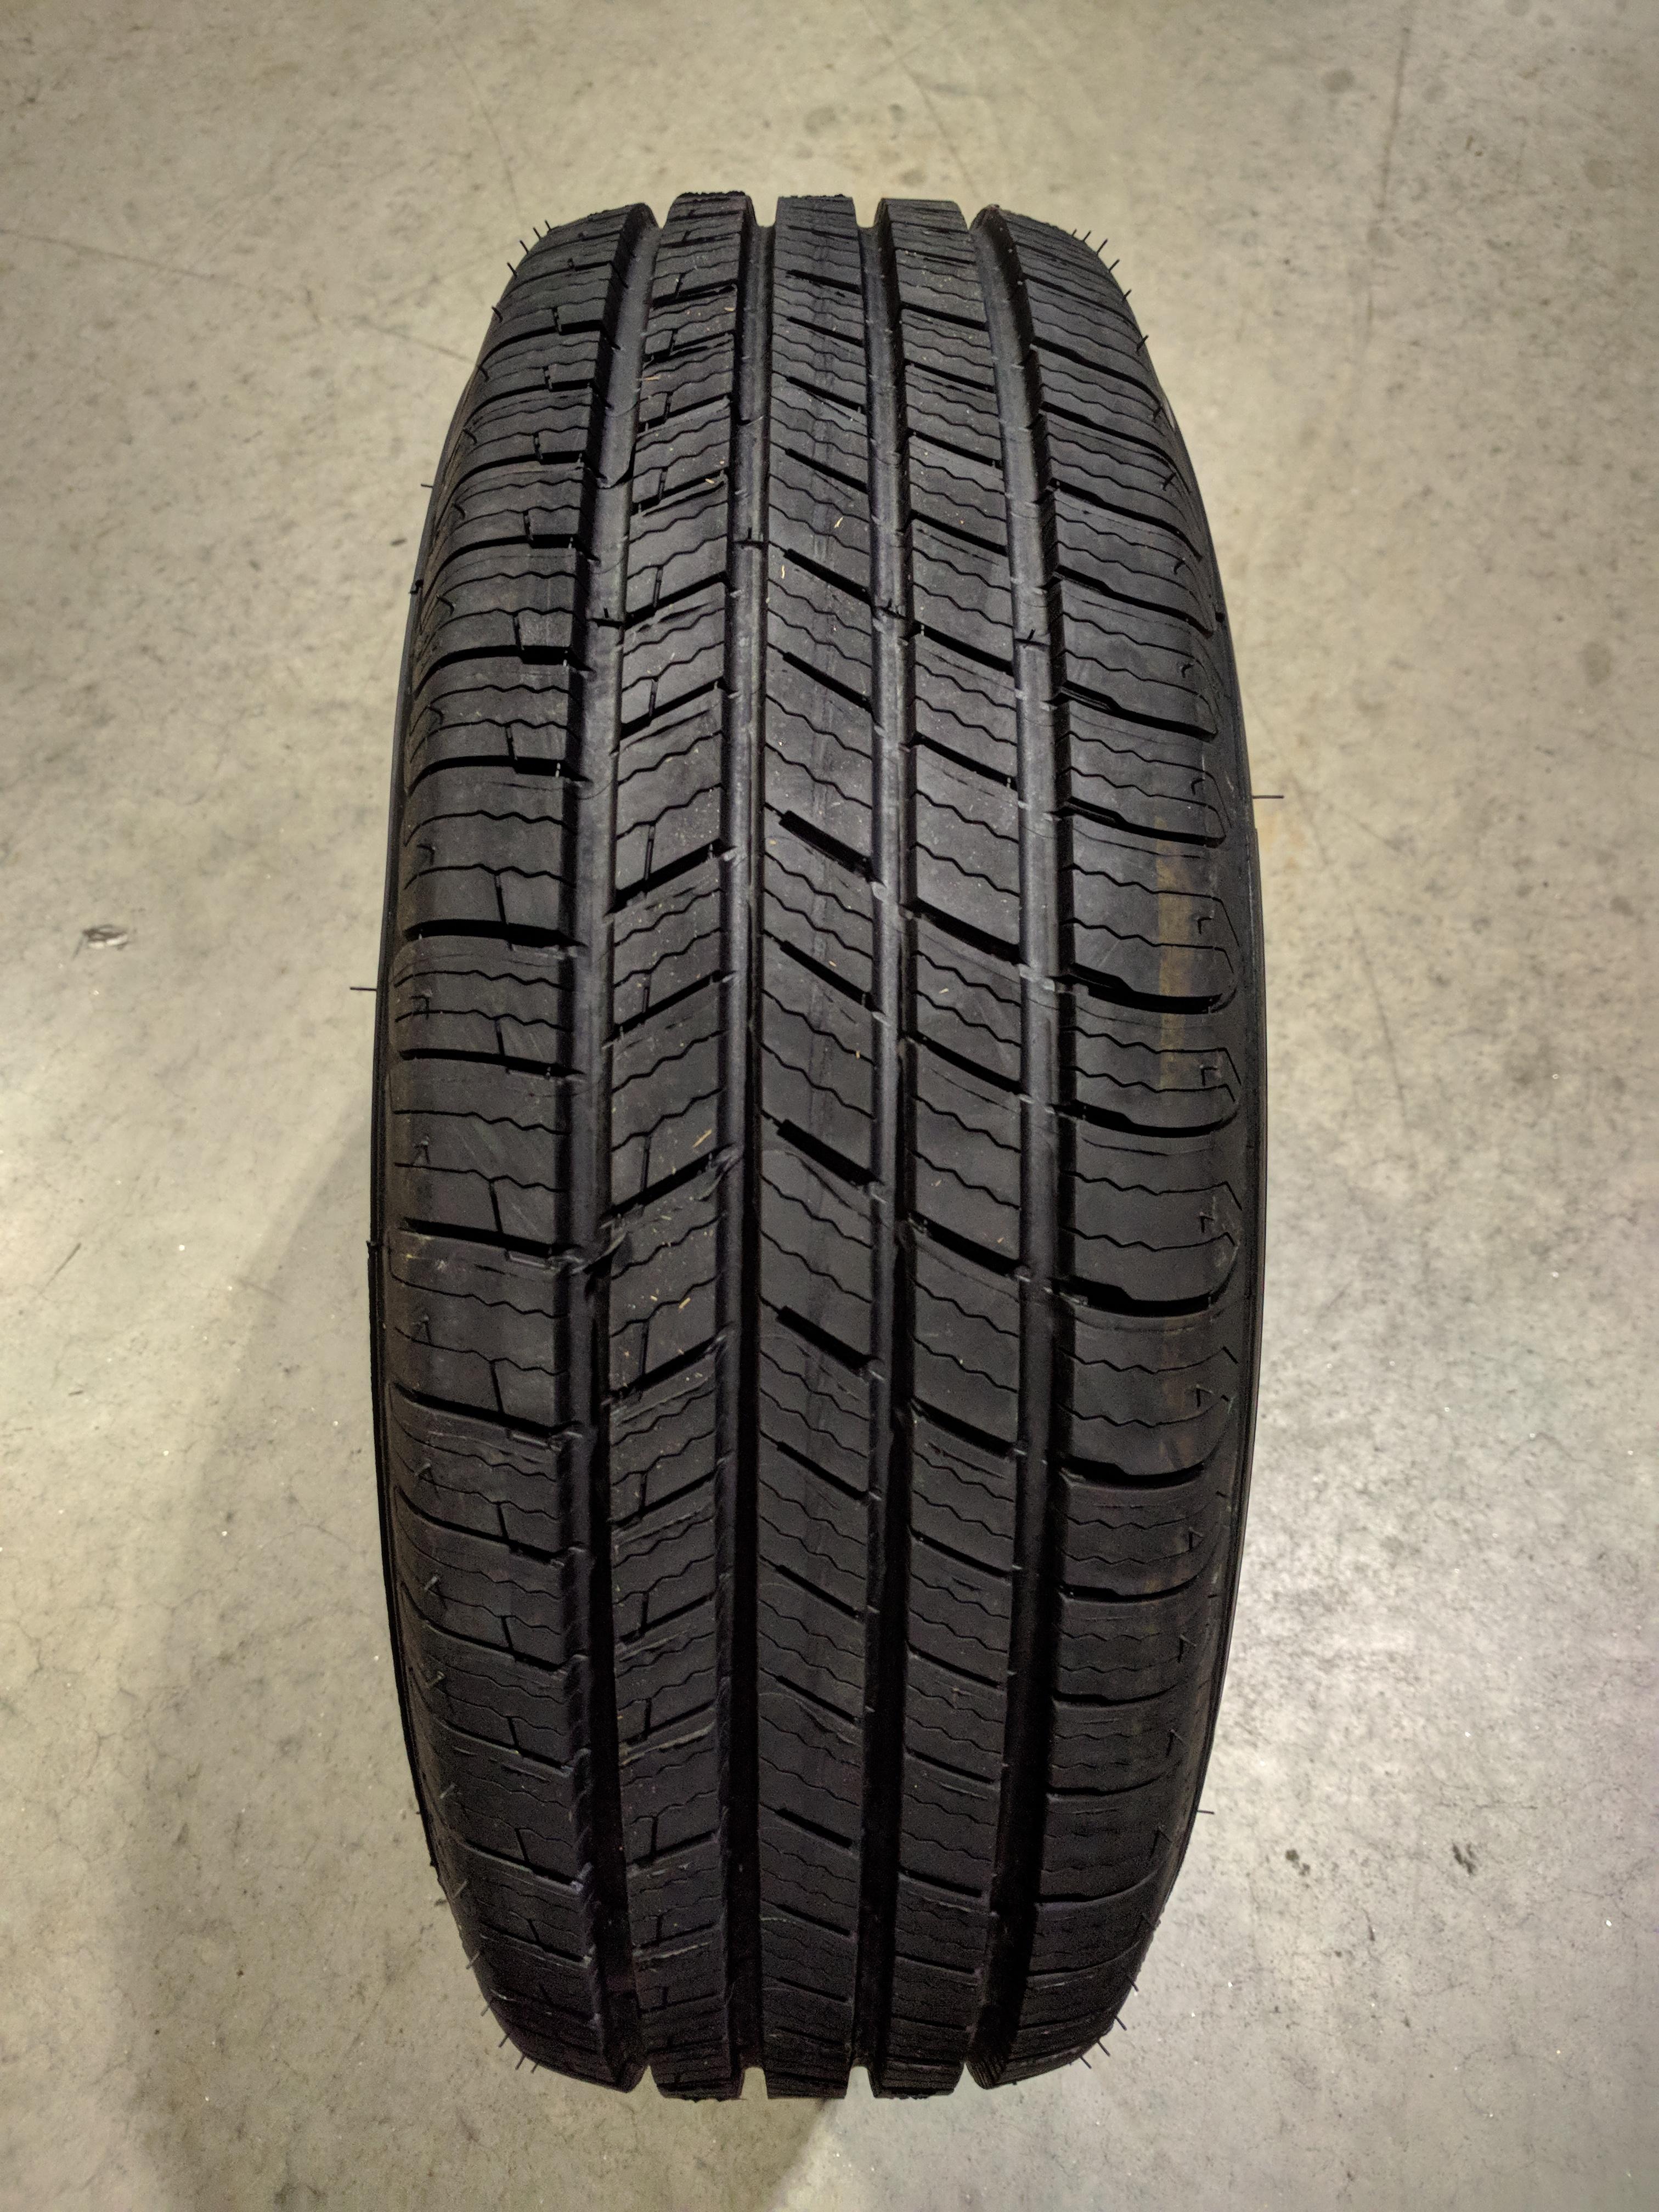 Michelin Defender T H >> 205 65r15 Michelin Defender T H All Season Tire 94h